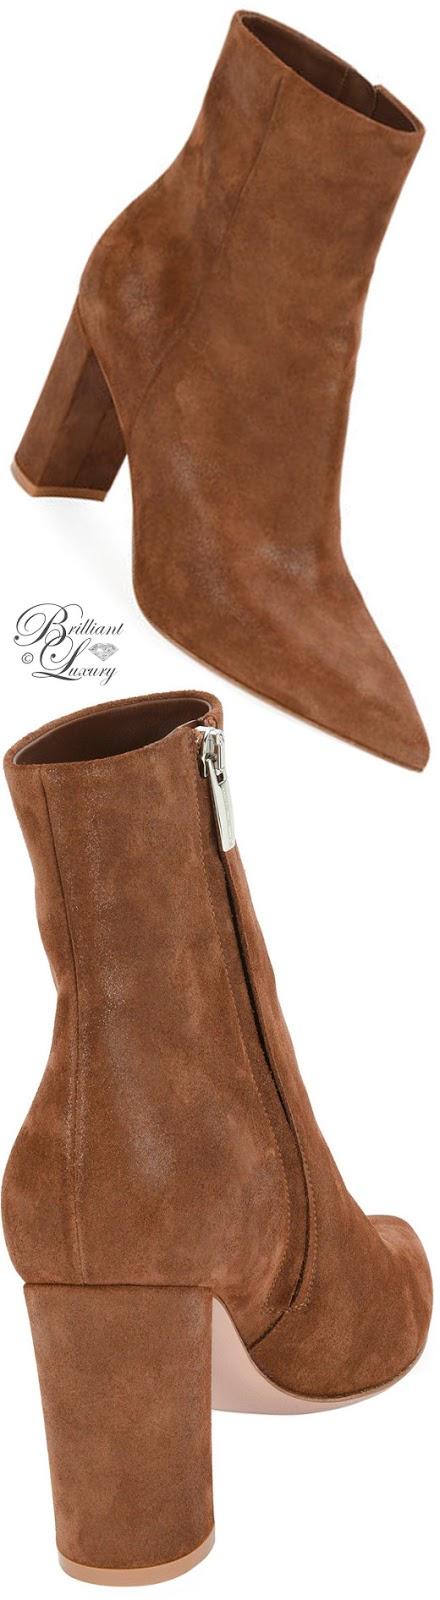 Brilliant Luxury ♦ Gianvito Rossi Pointy-Toe Block-Heel Bootie